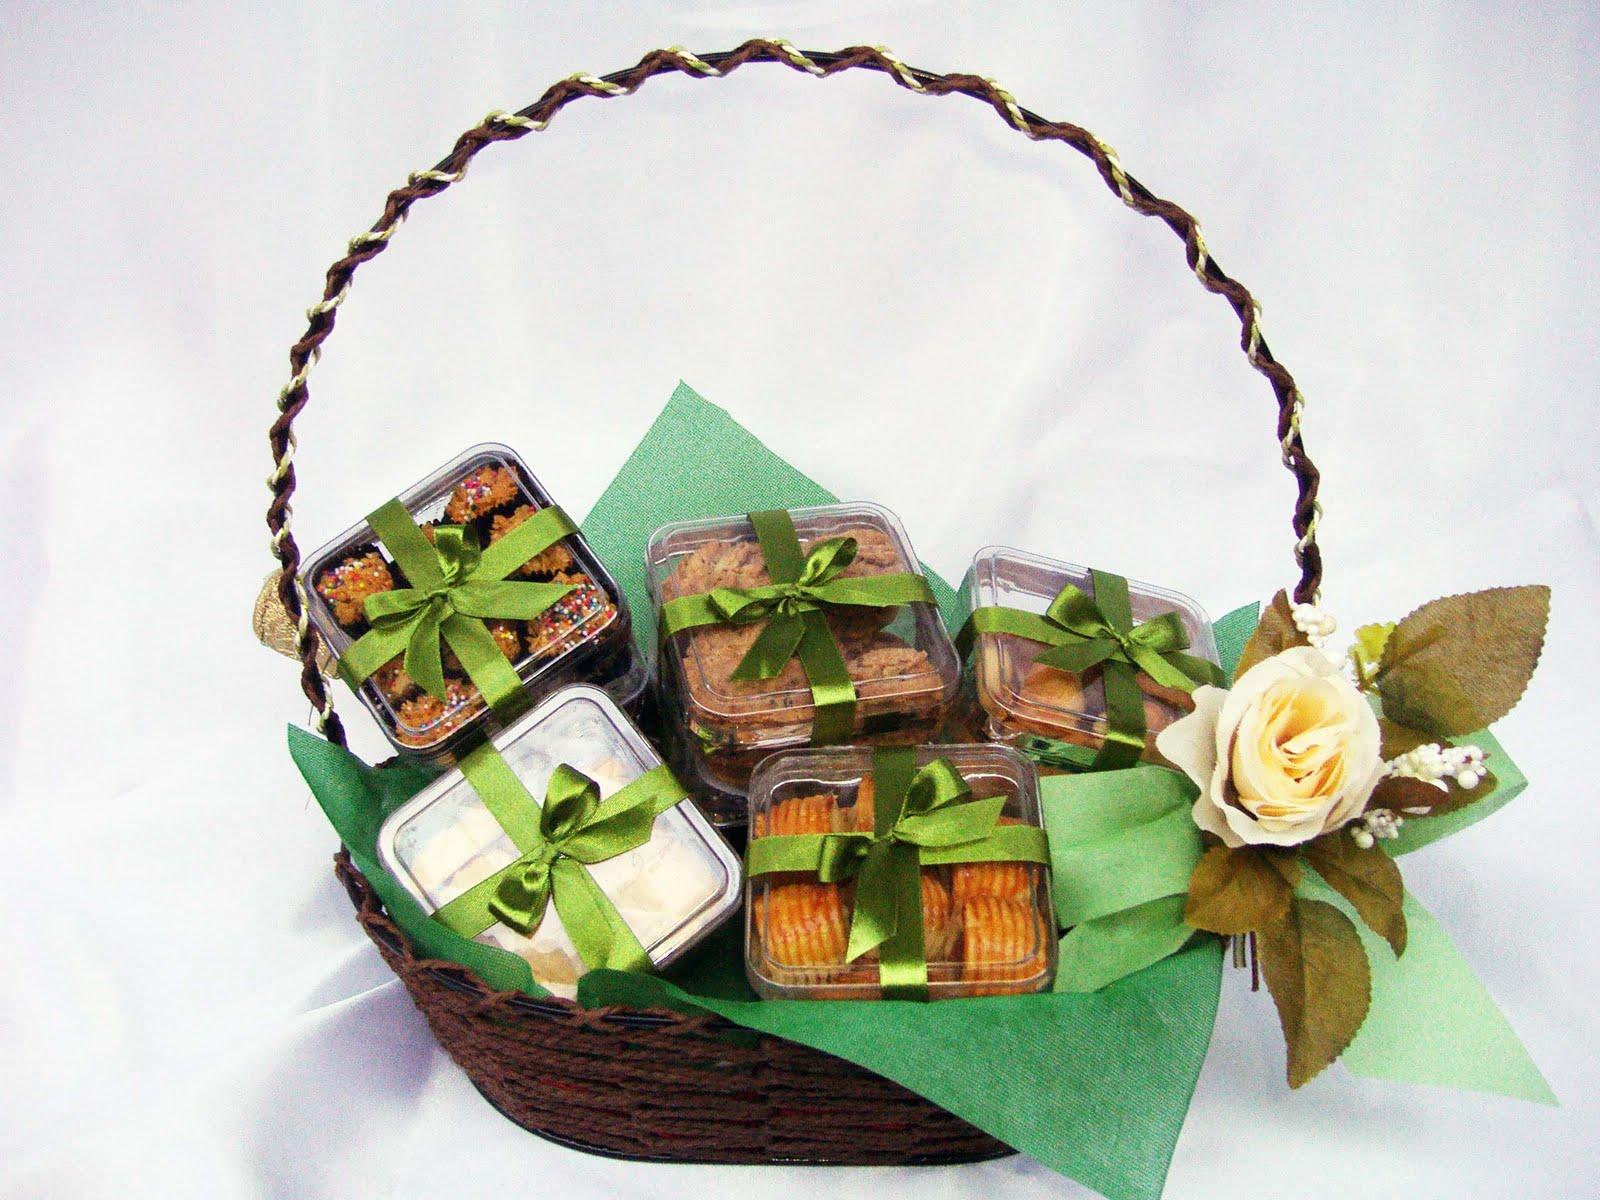 Sweeties Gifts Amp Hampers Hari Raya Aidilfitri Hamper